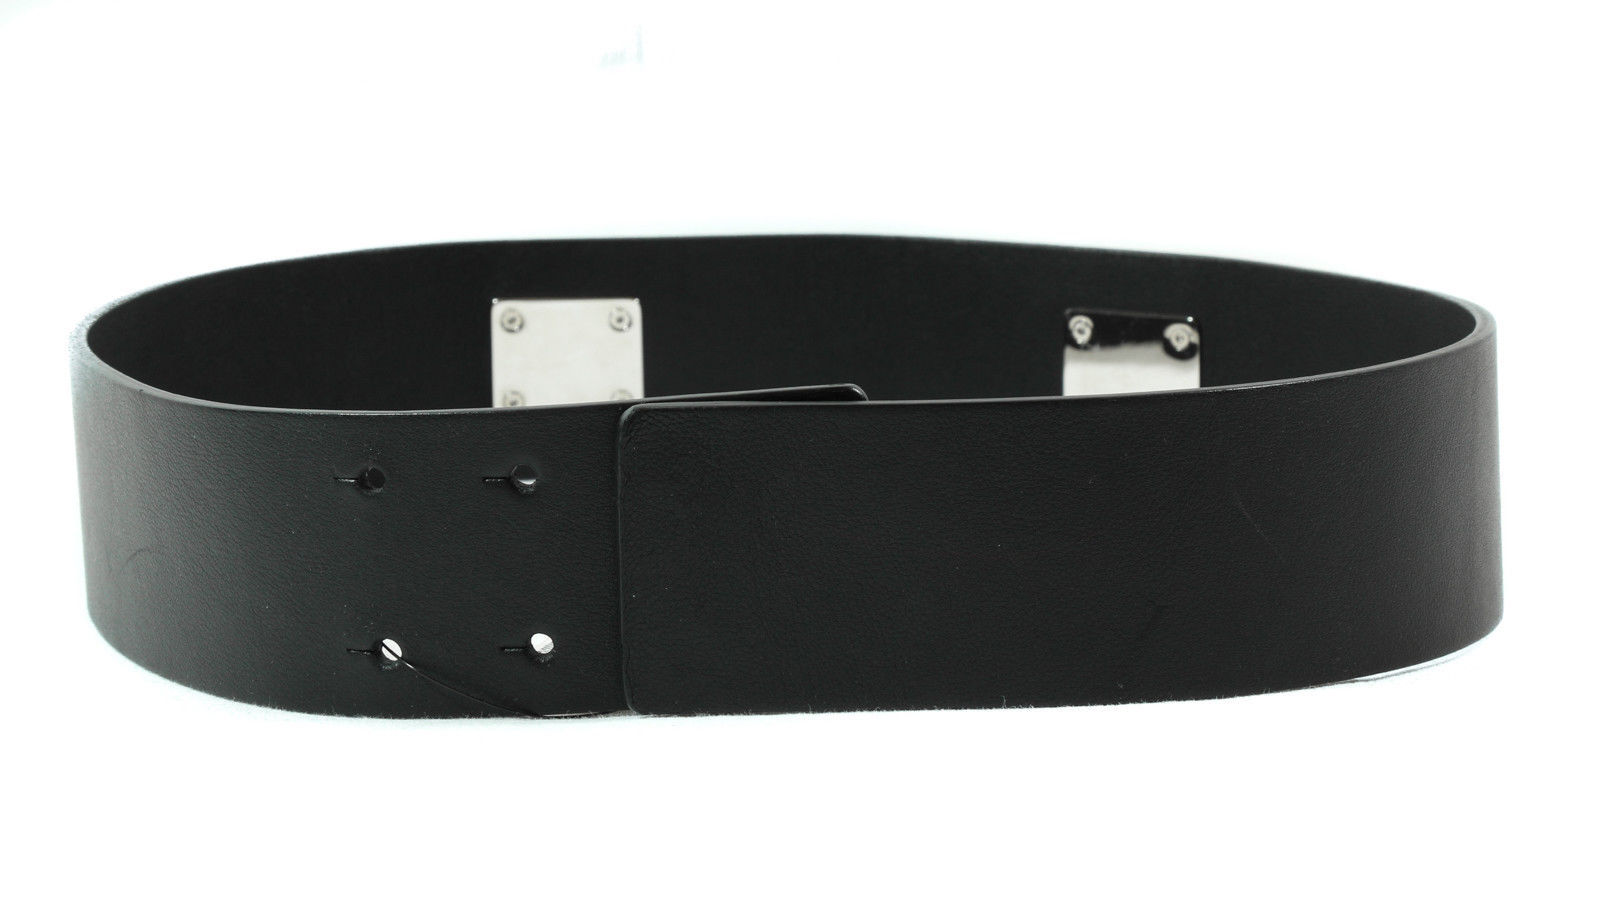 430db3c9c2d8cc NWT GUCCI 363024 Leather Horsebit Waist and 40 similar items